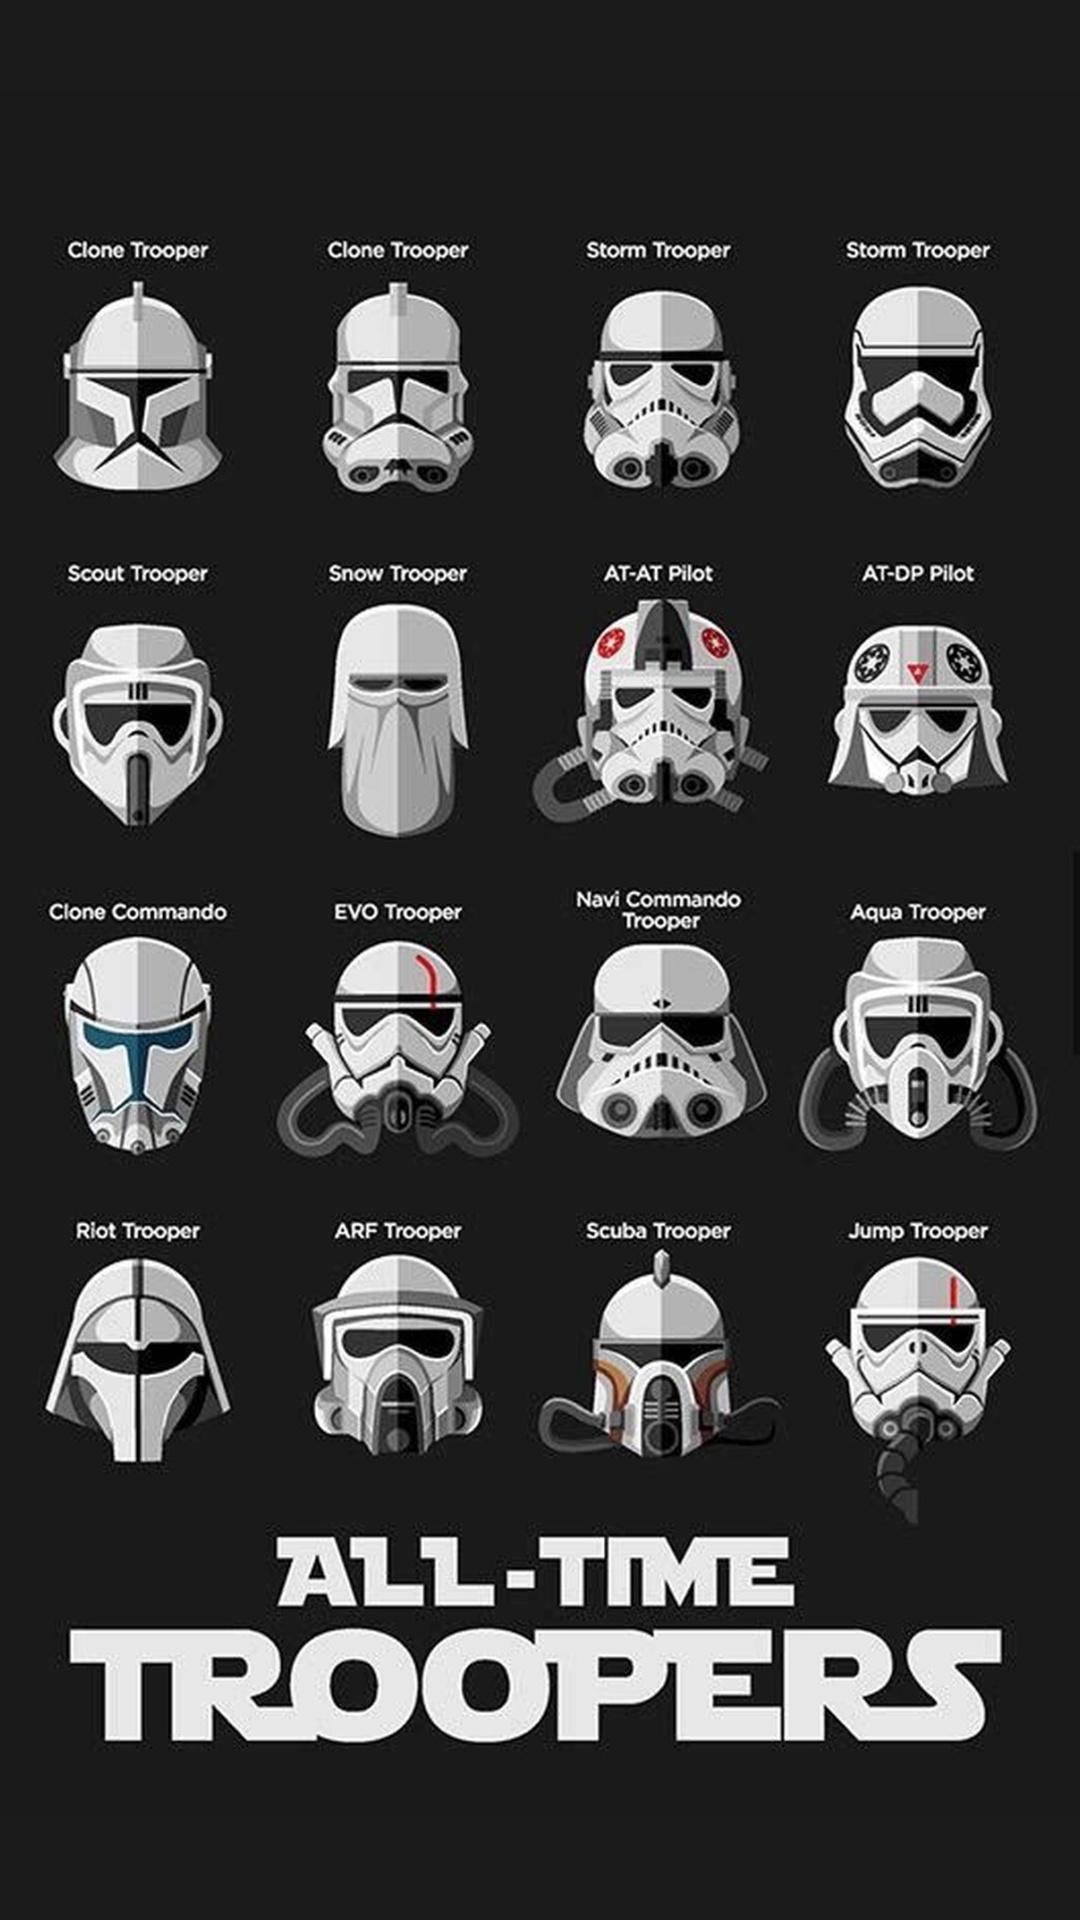 Download Clone Trooper Wallpaper Hd Hd Backgrounds Download